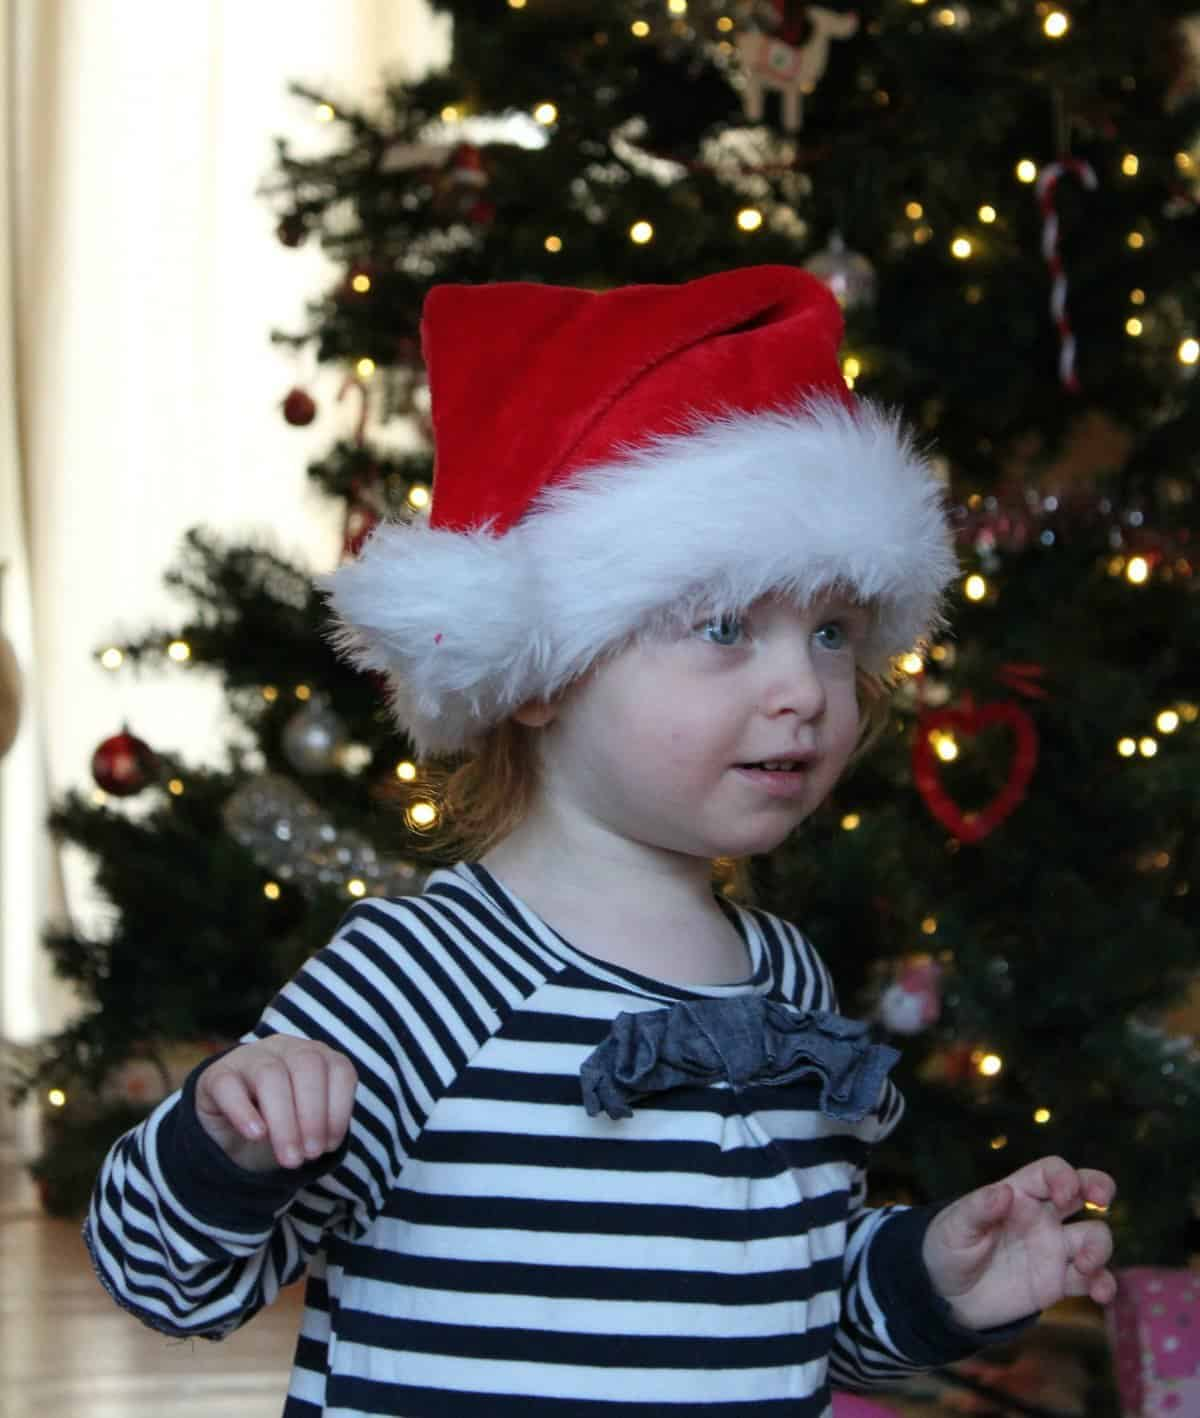 Santa Hat - The Ordinary Moments